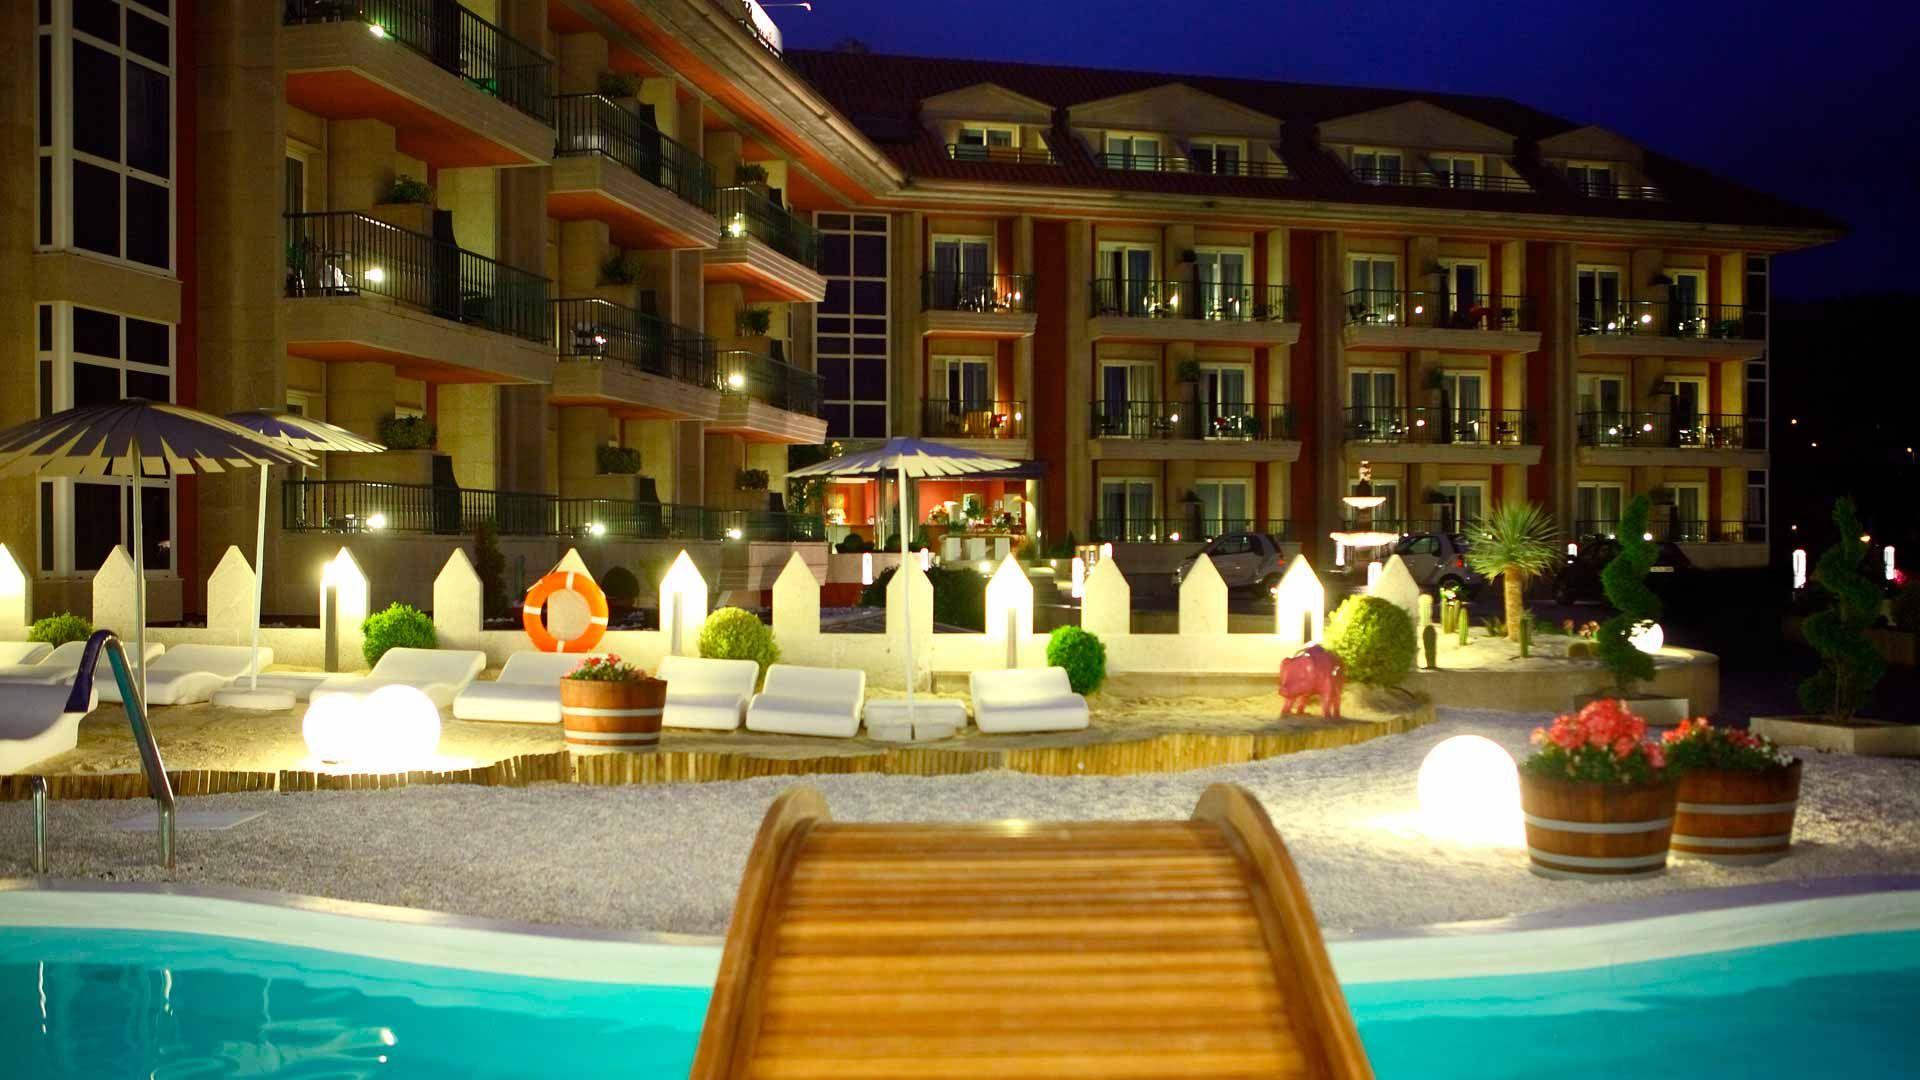 Grupo solvida hoteles hotel de lujo galicia hoteles for Hoteles de lujo fotos